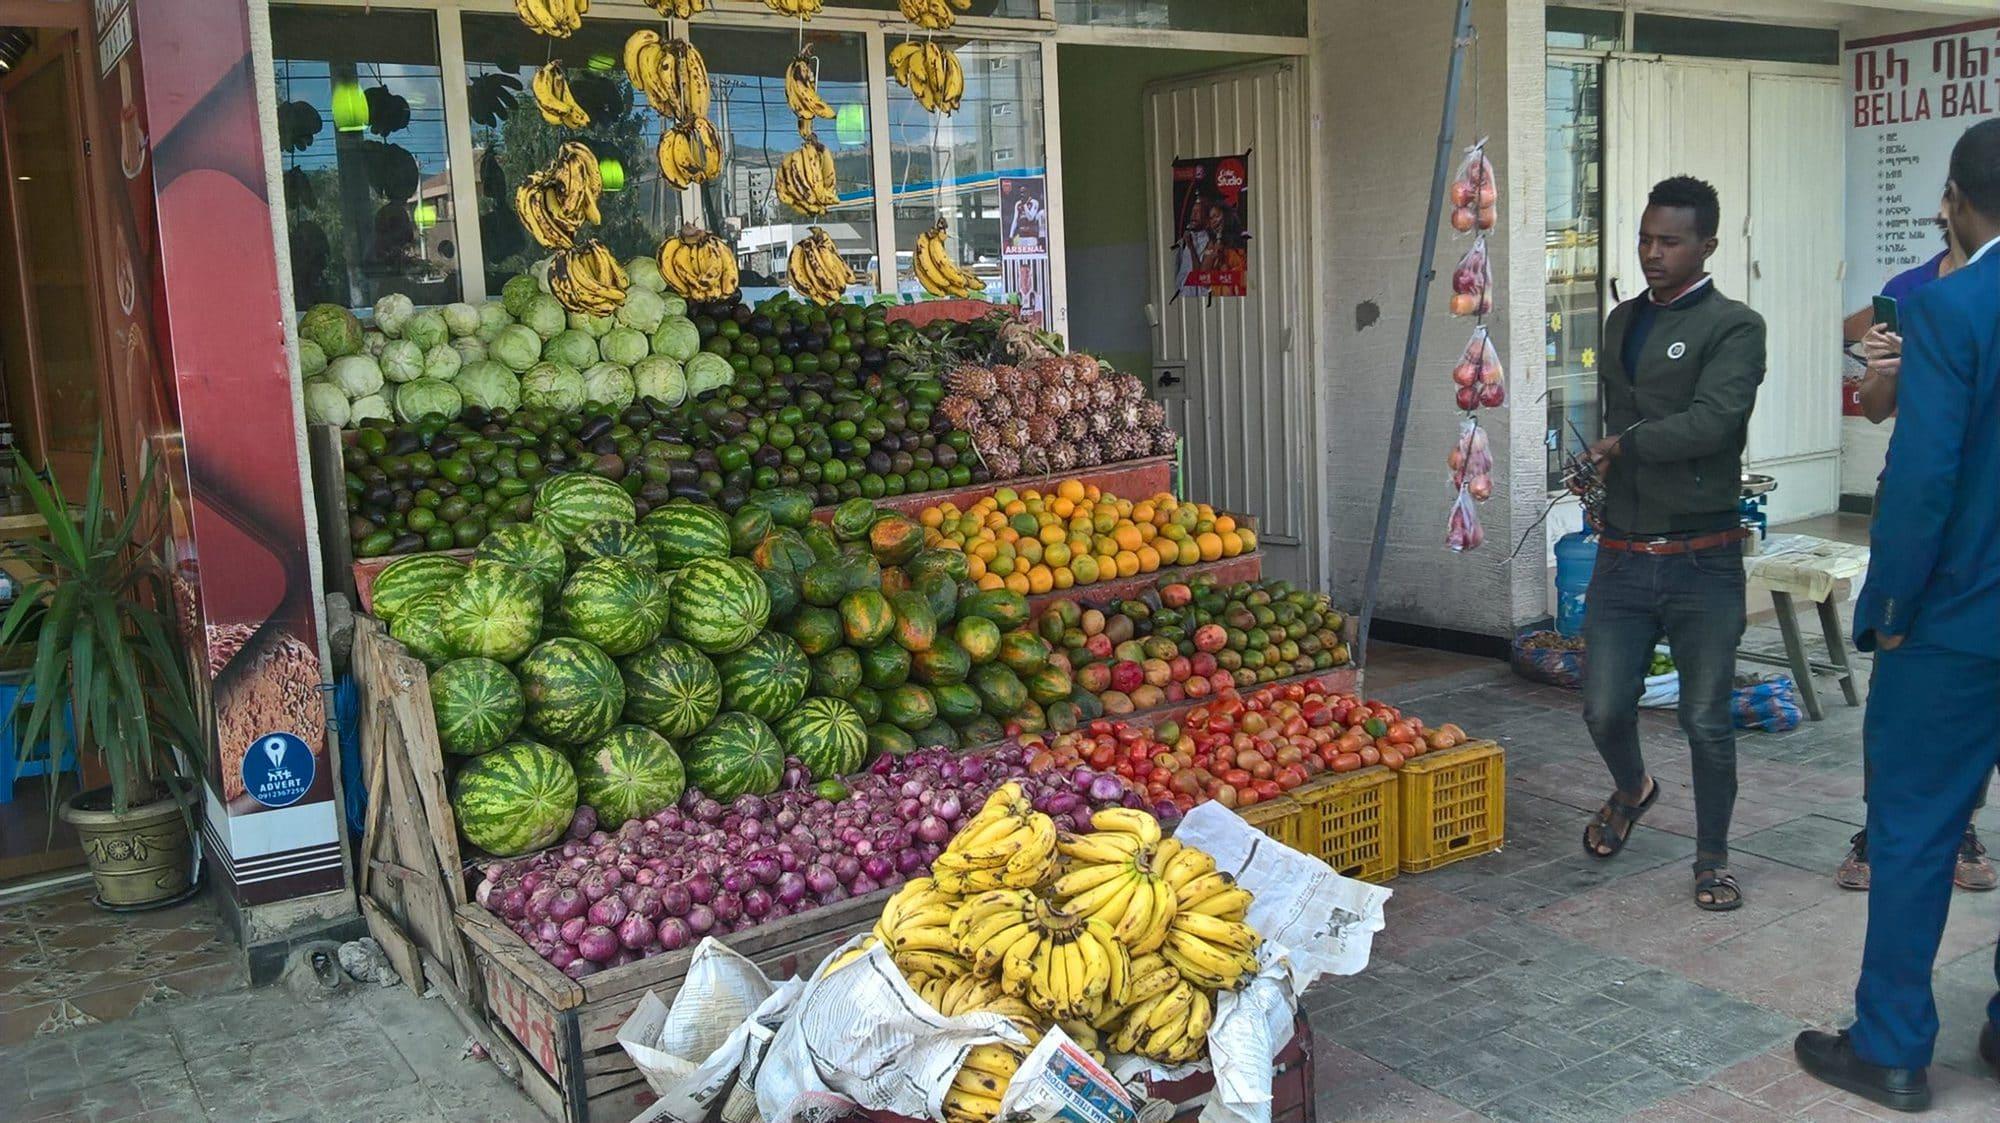 Fruit and vegetable shop in Addis Ababa, Ethiopia (photo credit: University of Florida/Geraldine Klarenberg).